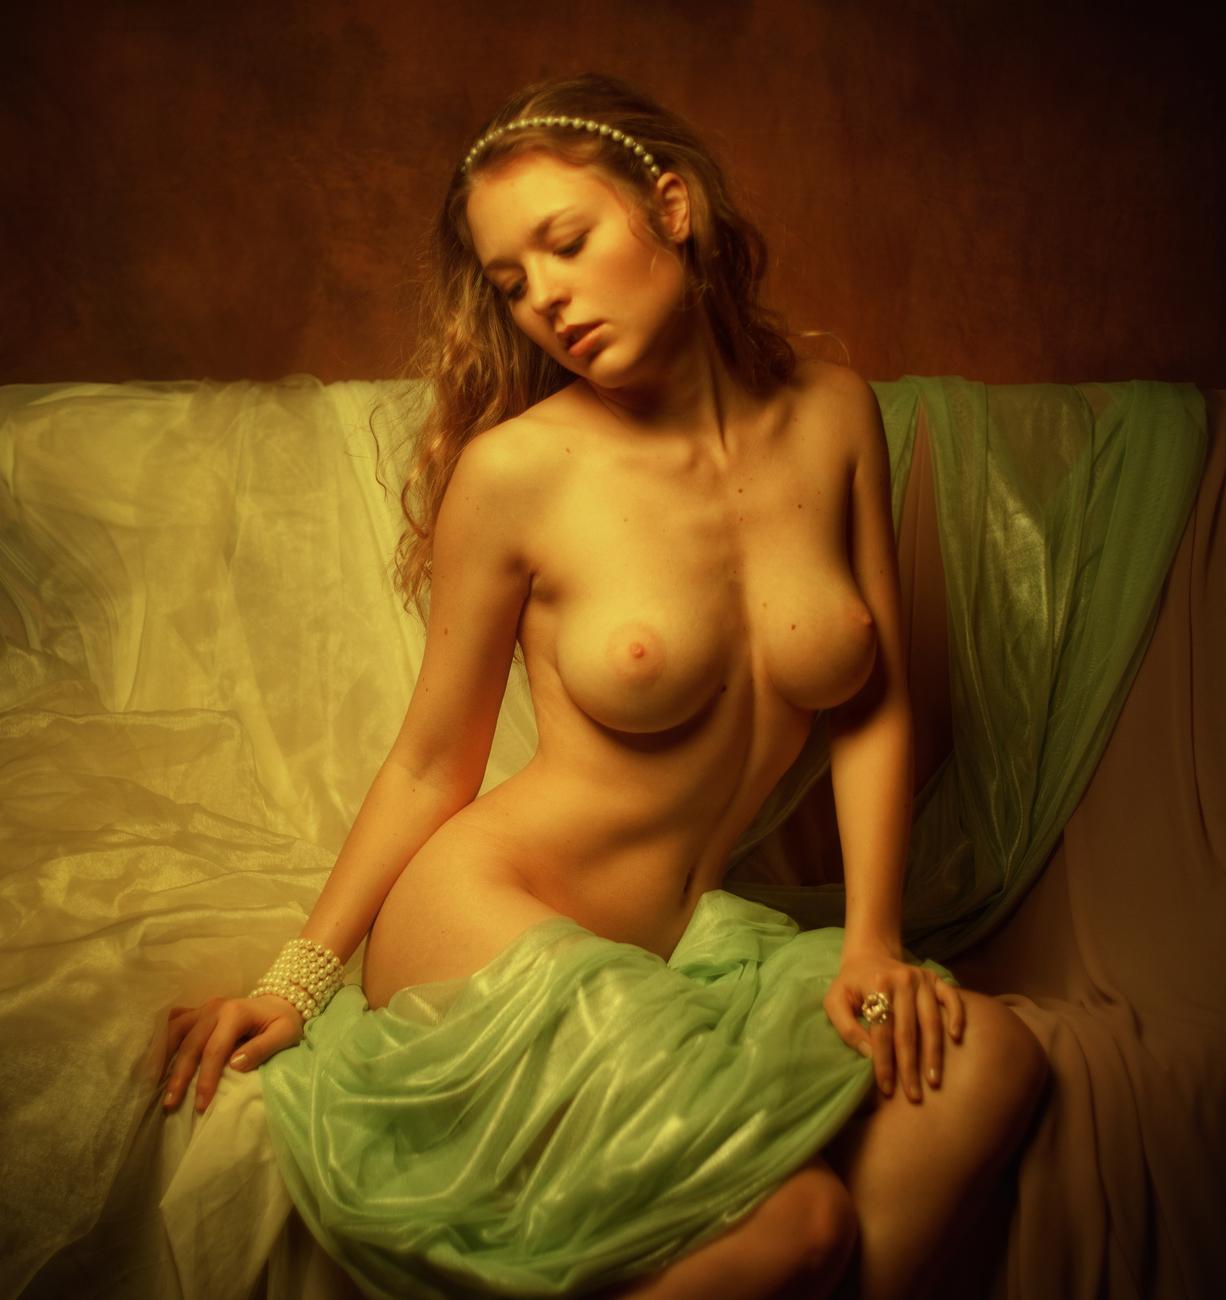 Naked girls self portraits